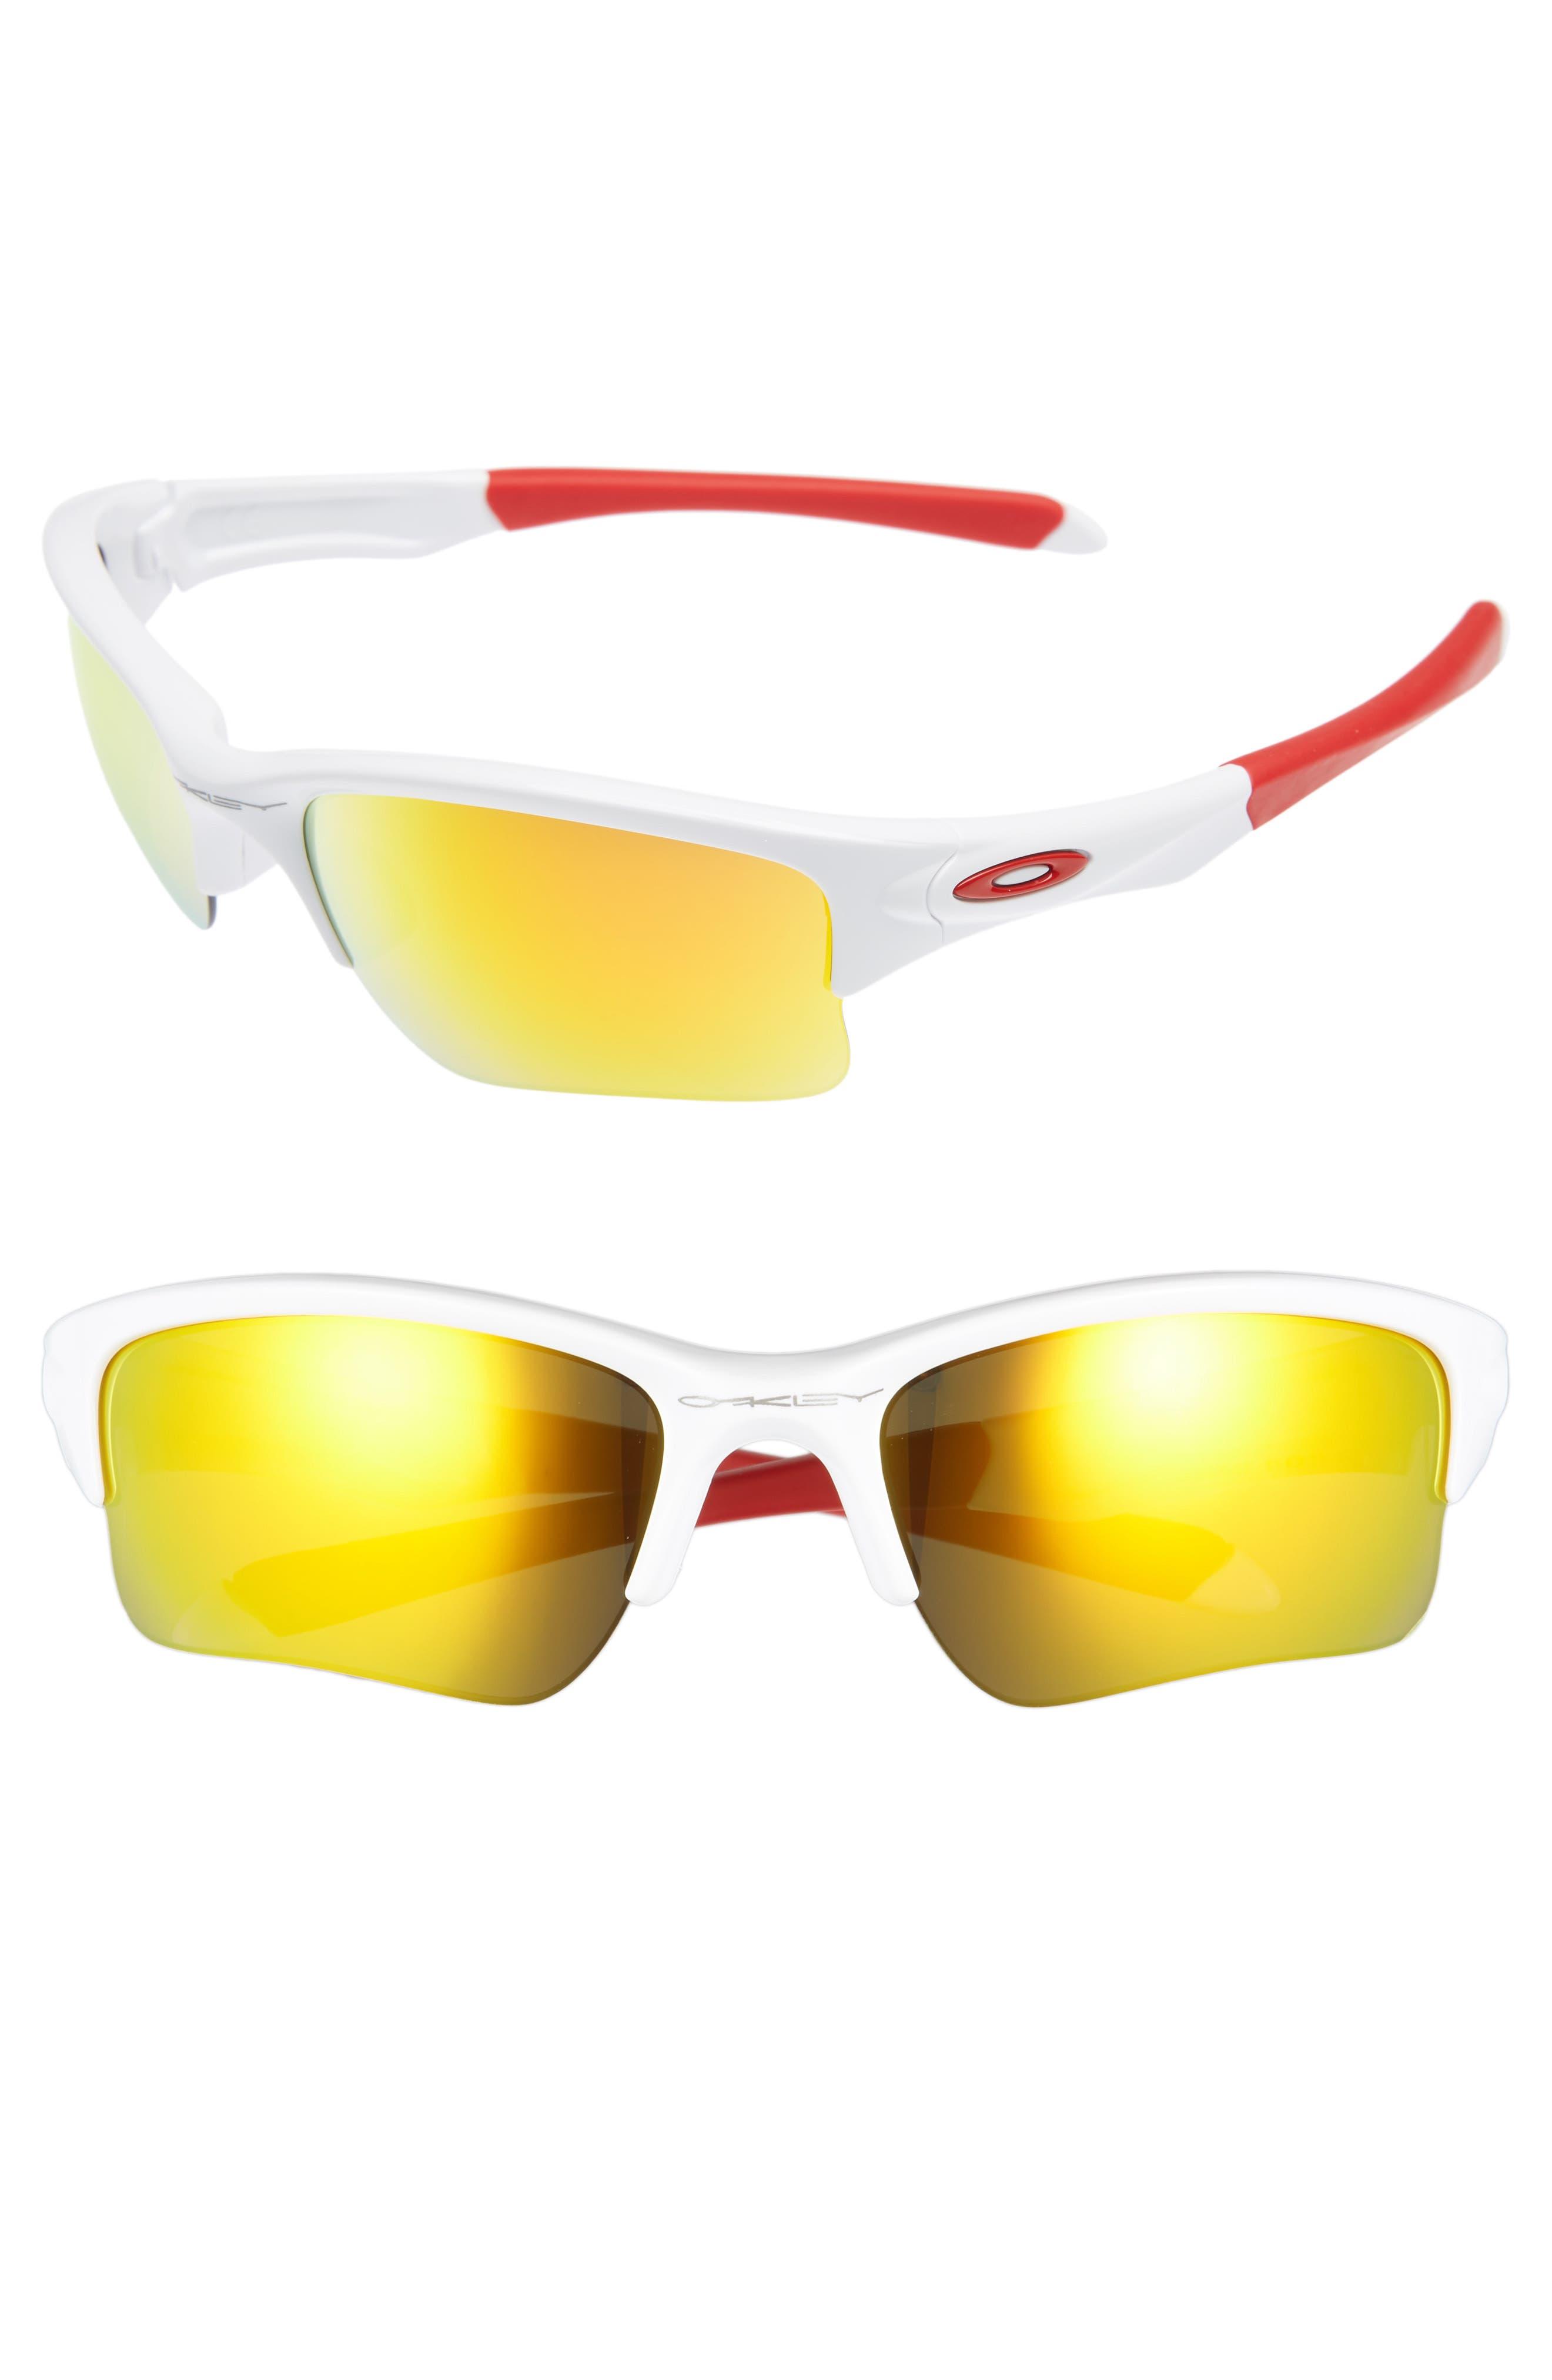 Oakley Quarter Jacket PRIZM™ 61mm Semi-Rimless Sunglasses